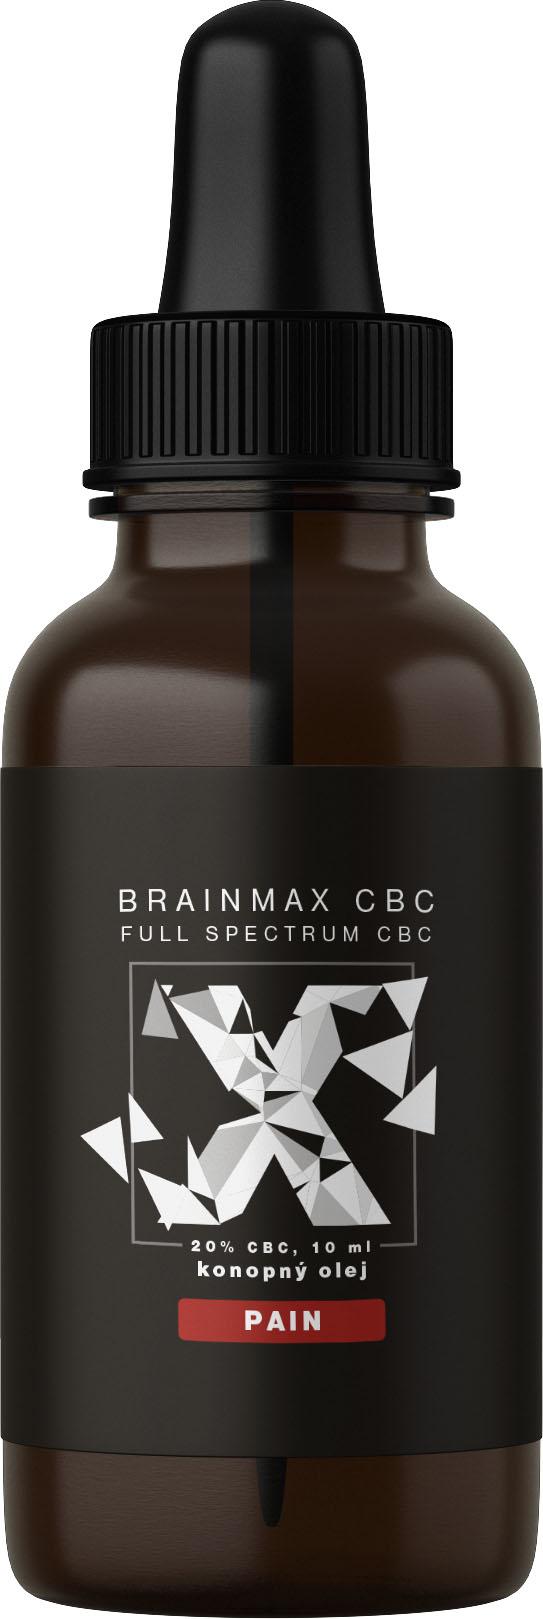 BrainMax CéBéCé PAIN, 20%, 10 ml